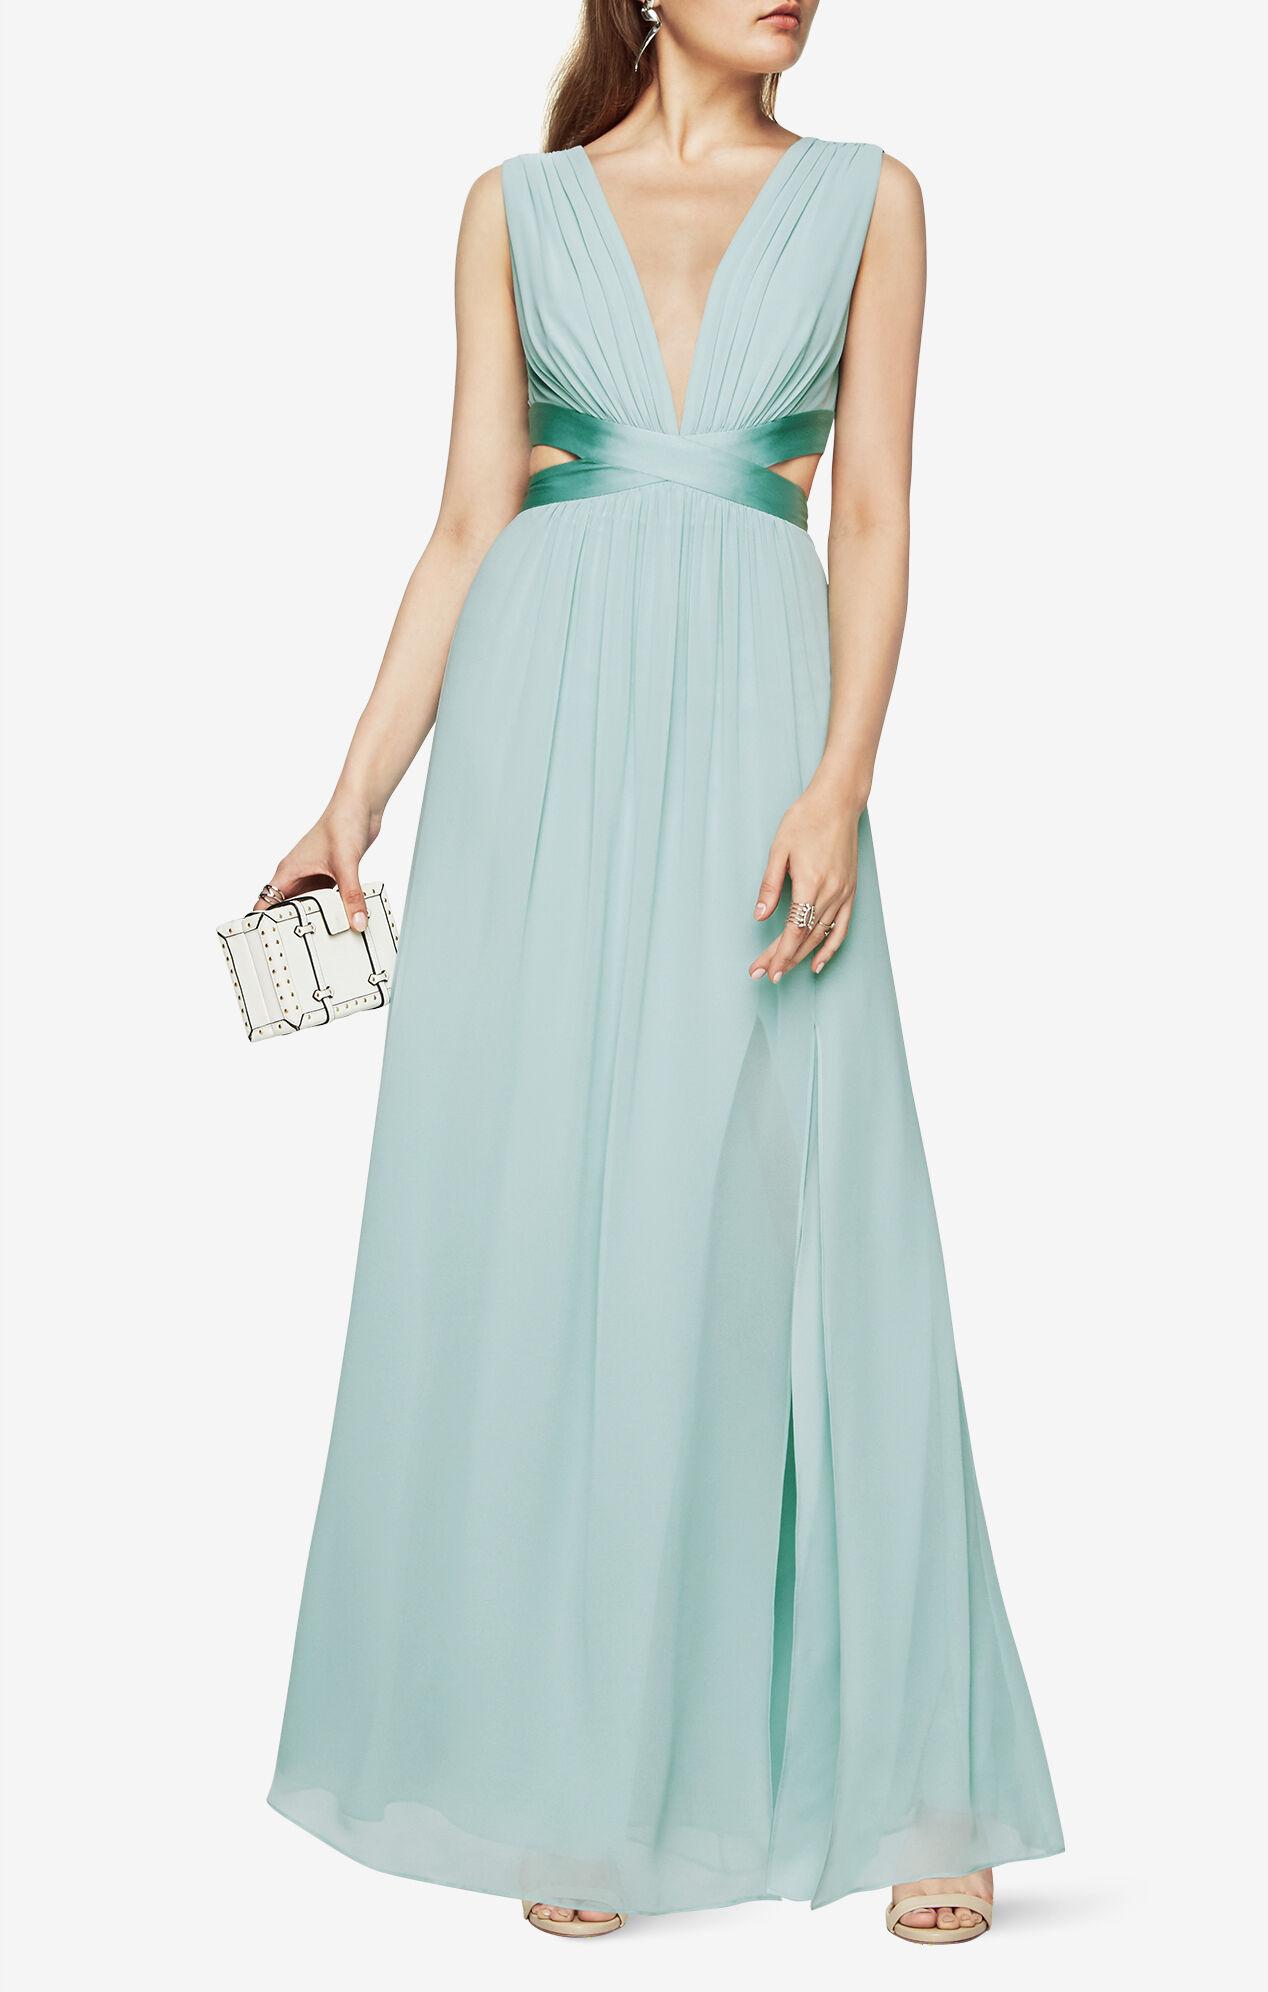 Dorable Wedding Dresses Bcbg Images - Womens Wedding Dresses ...